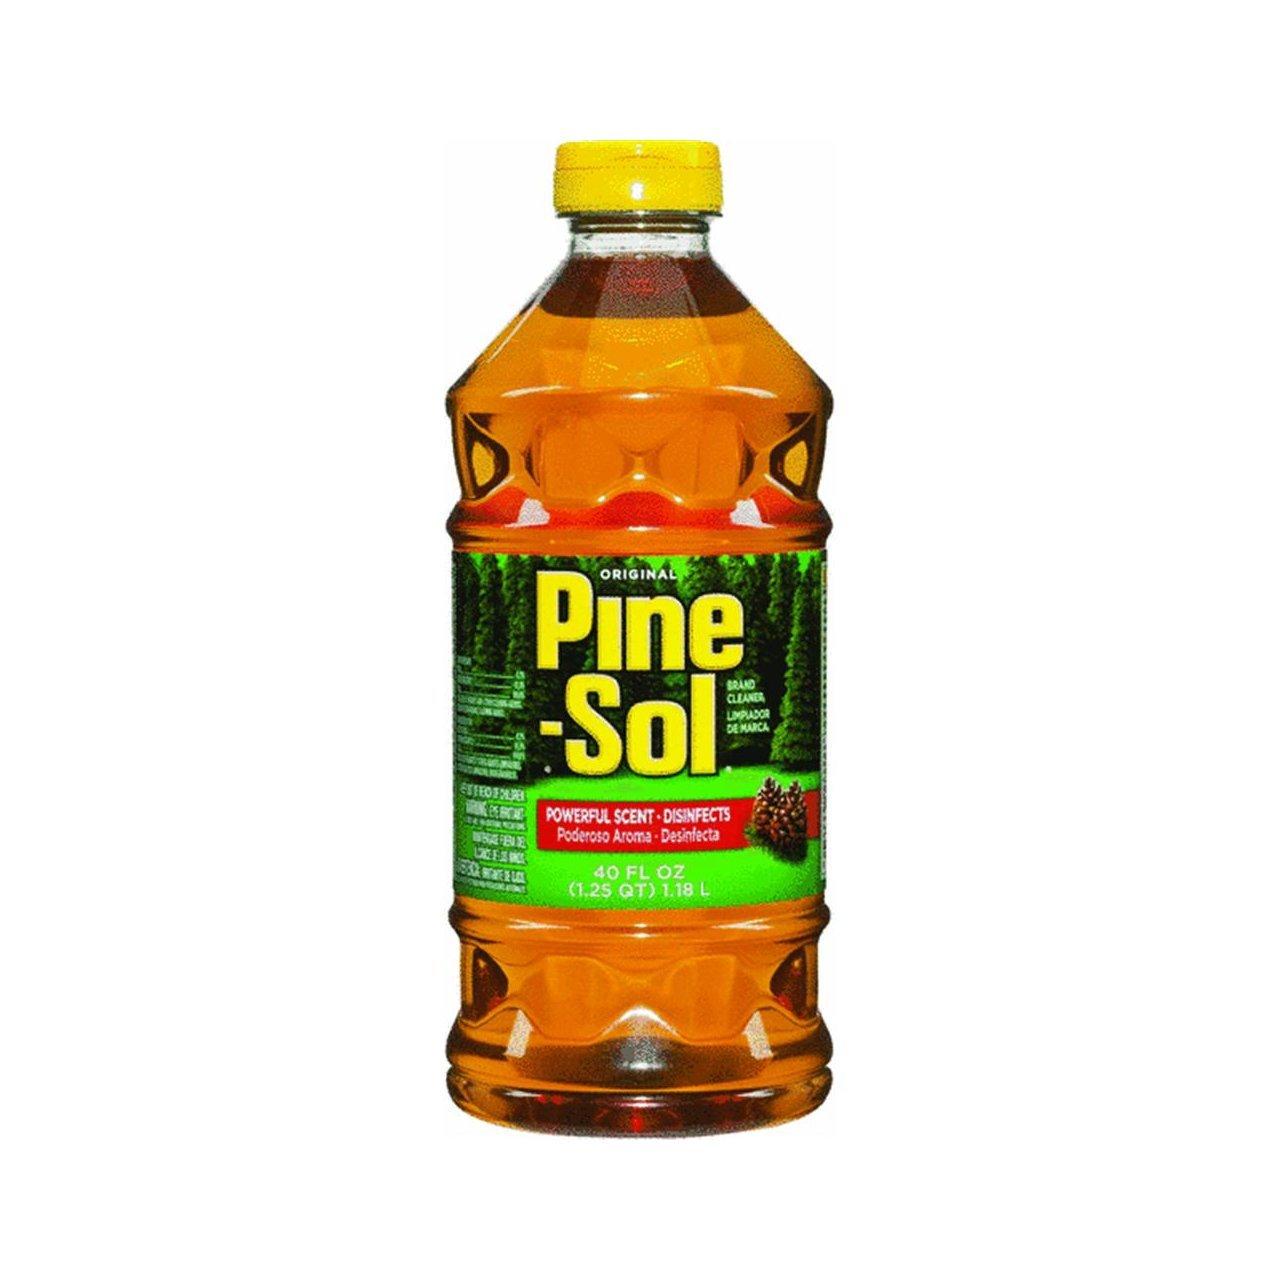 CLOROX 8 PACKS : Pine-Sol 40125 Liquid Cleaner, 40 fl oz ...